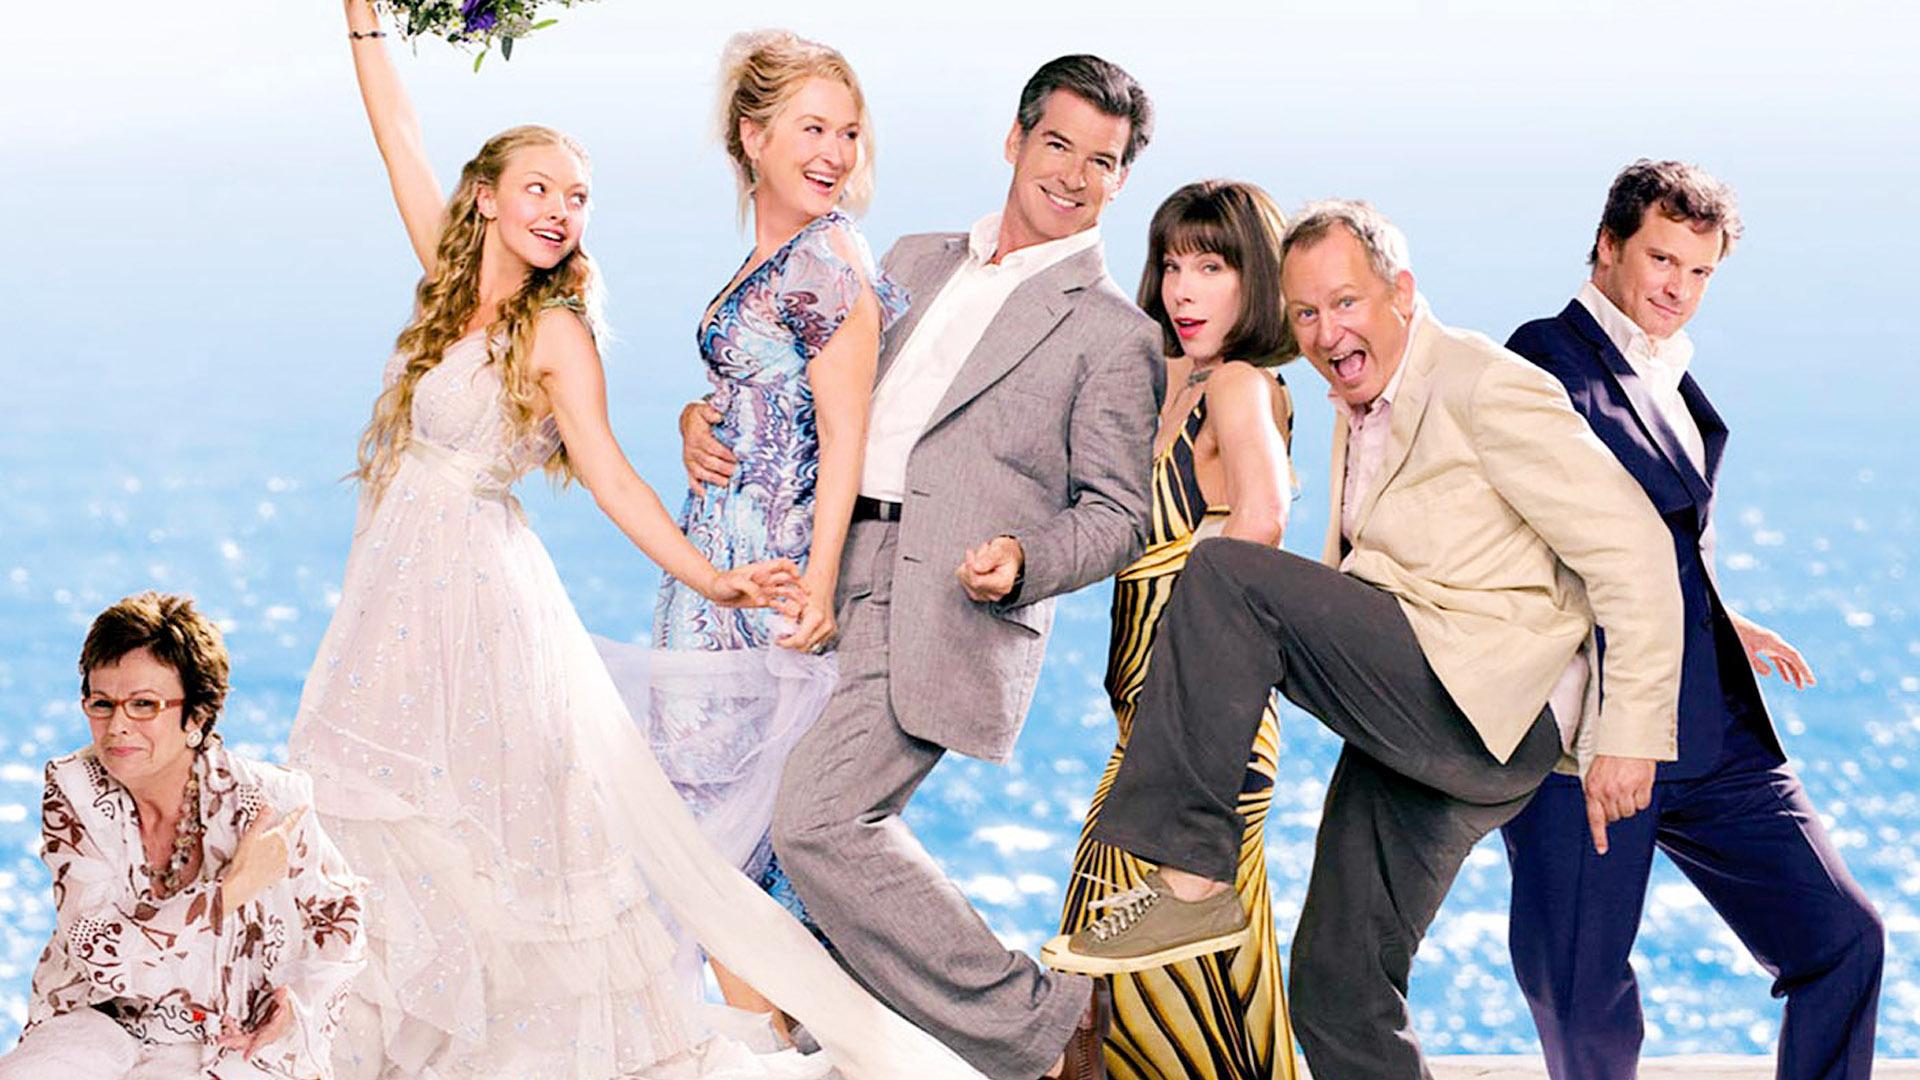 Mamma Mia in the Greek Islands - what an amazing honeymoon destination!